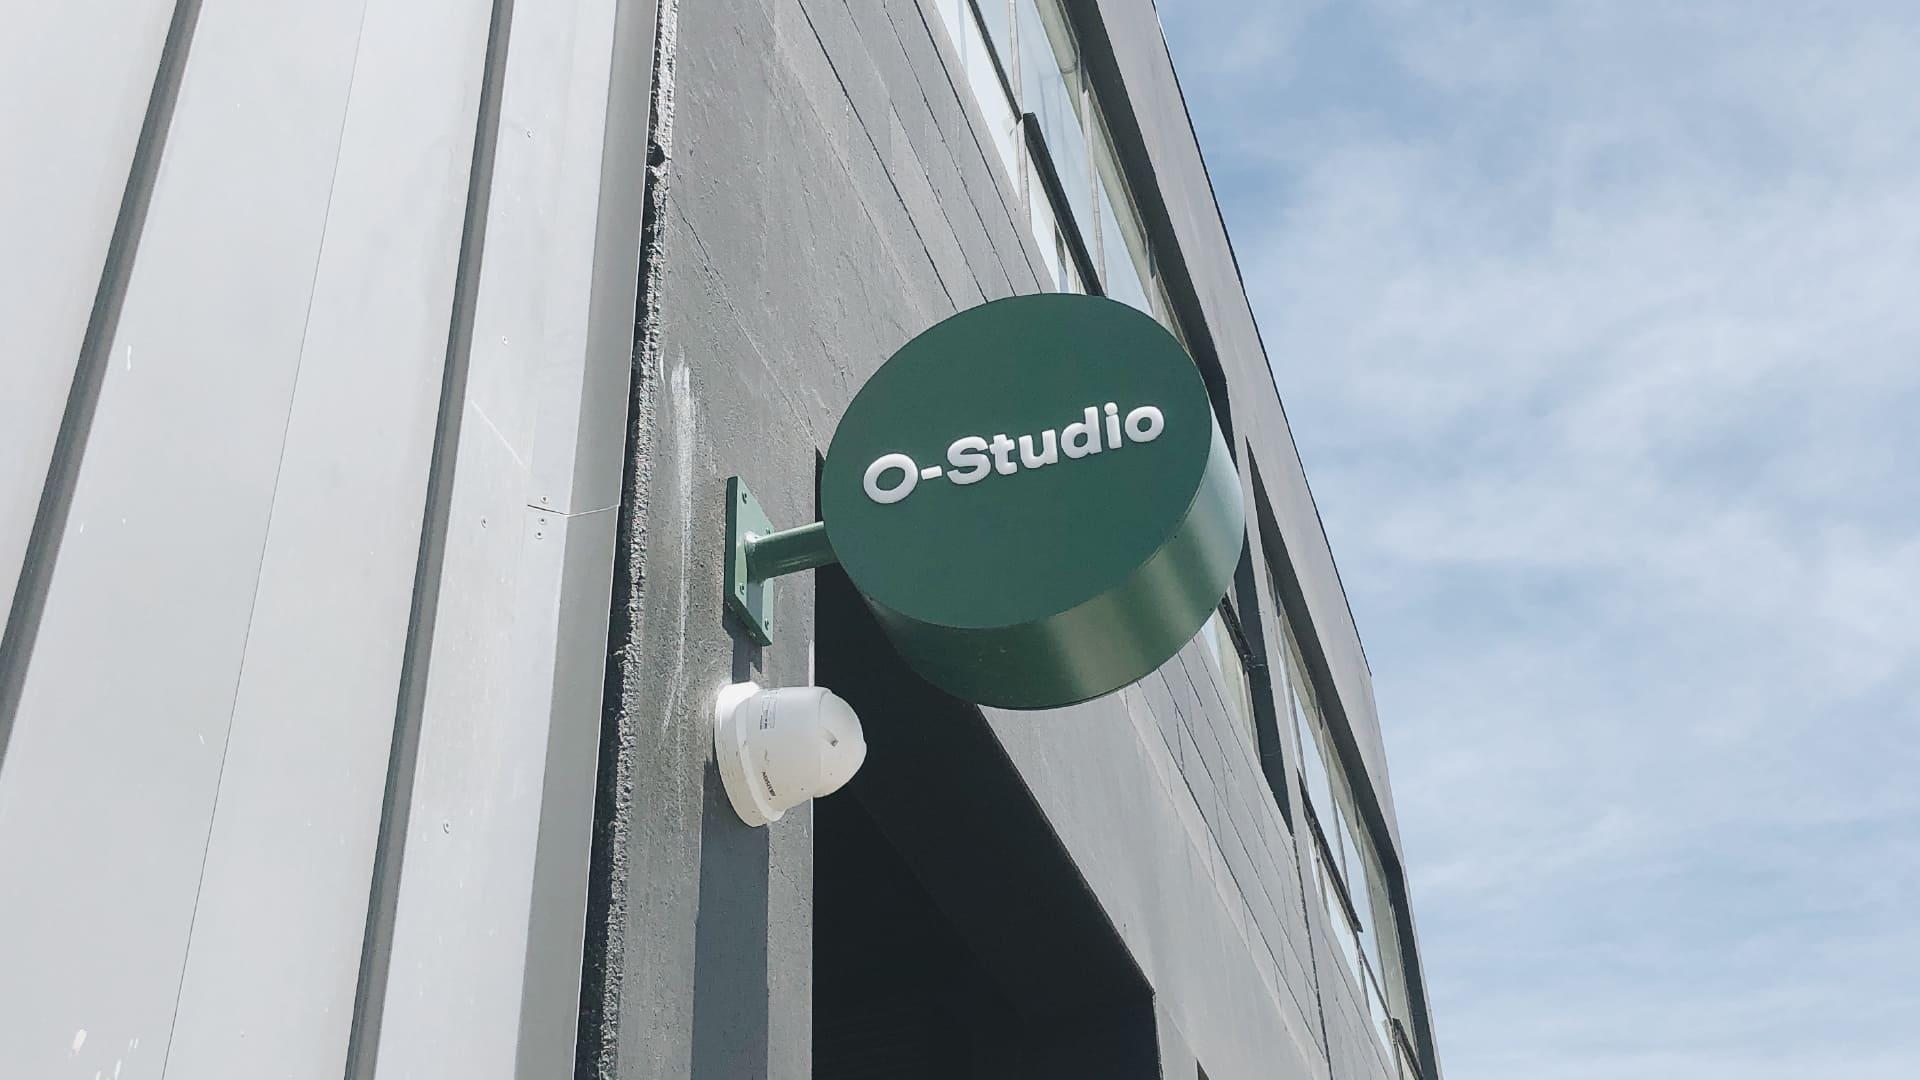 attraction studio o-studio brand outdoor signage